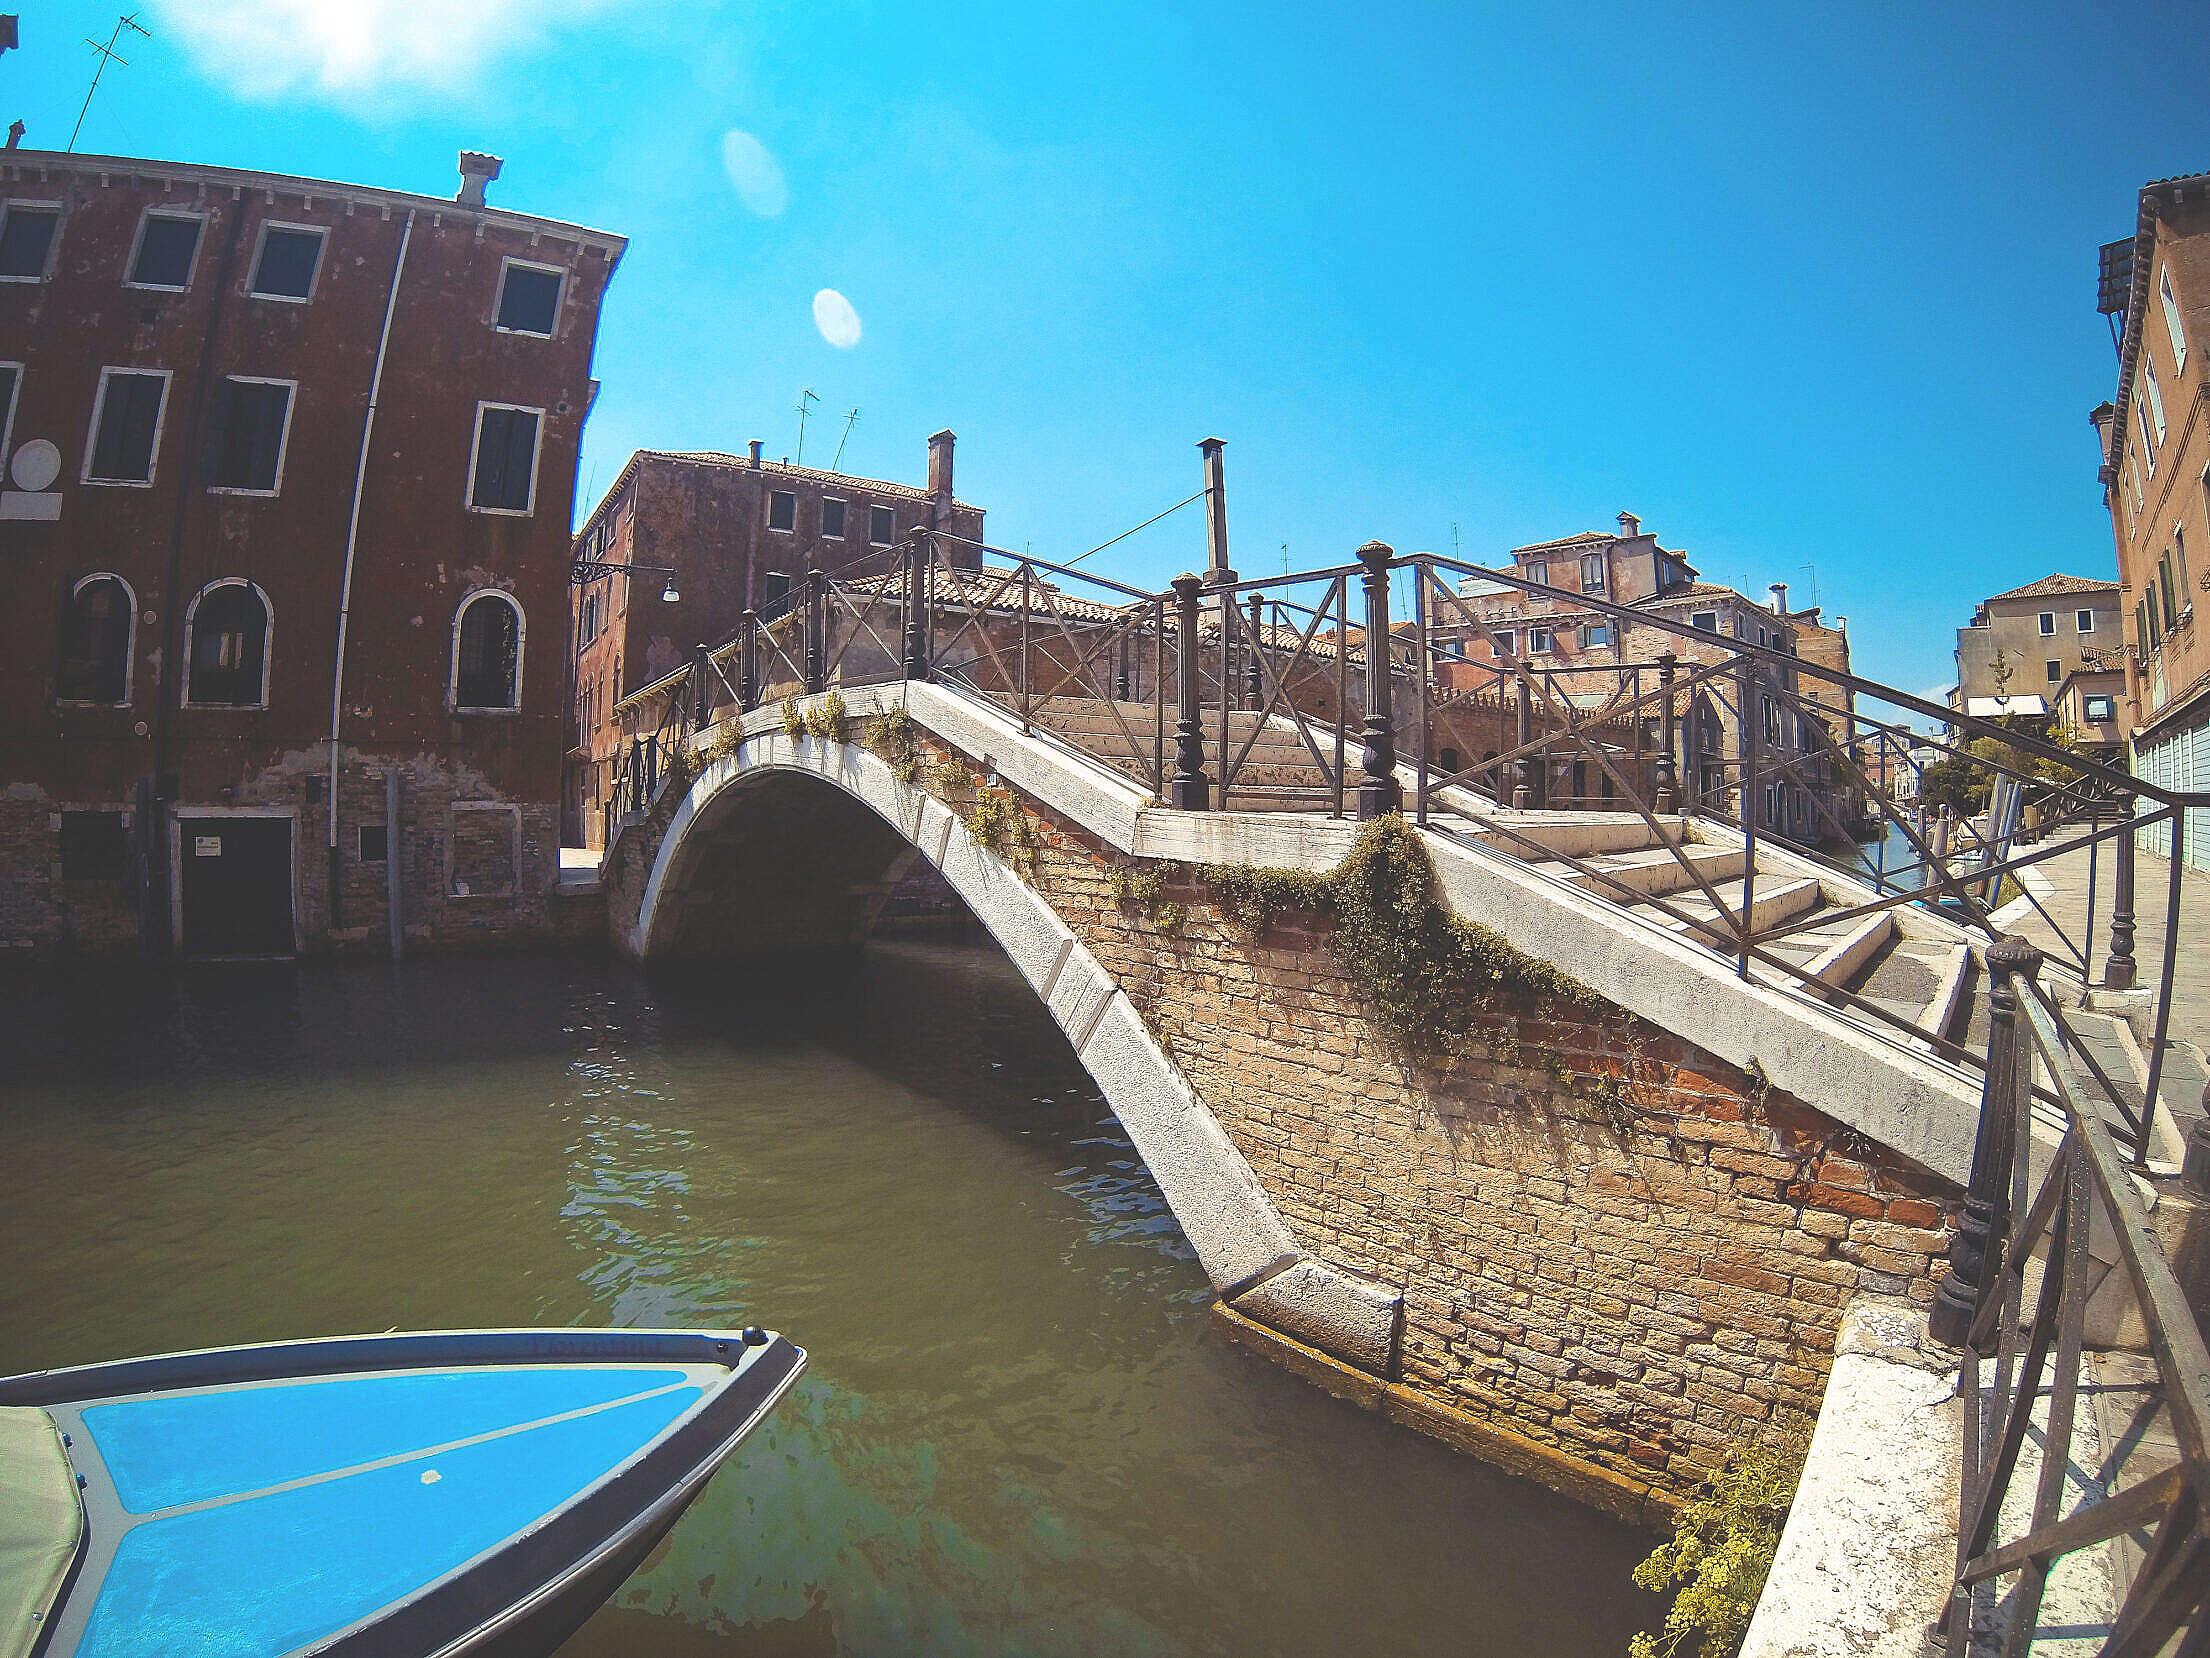 Venice Streets #2 Free Stock Photo